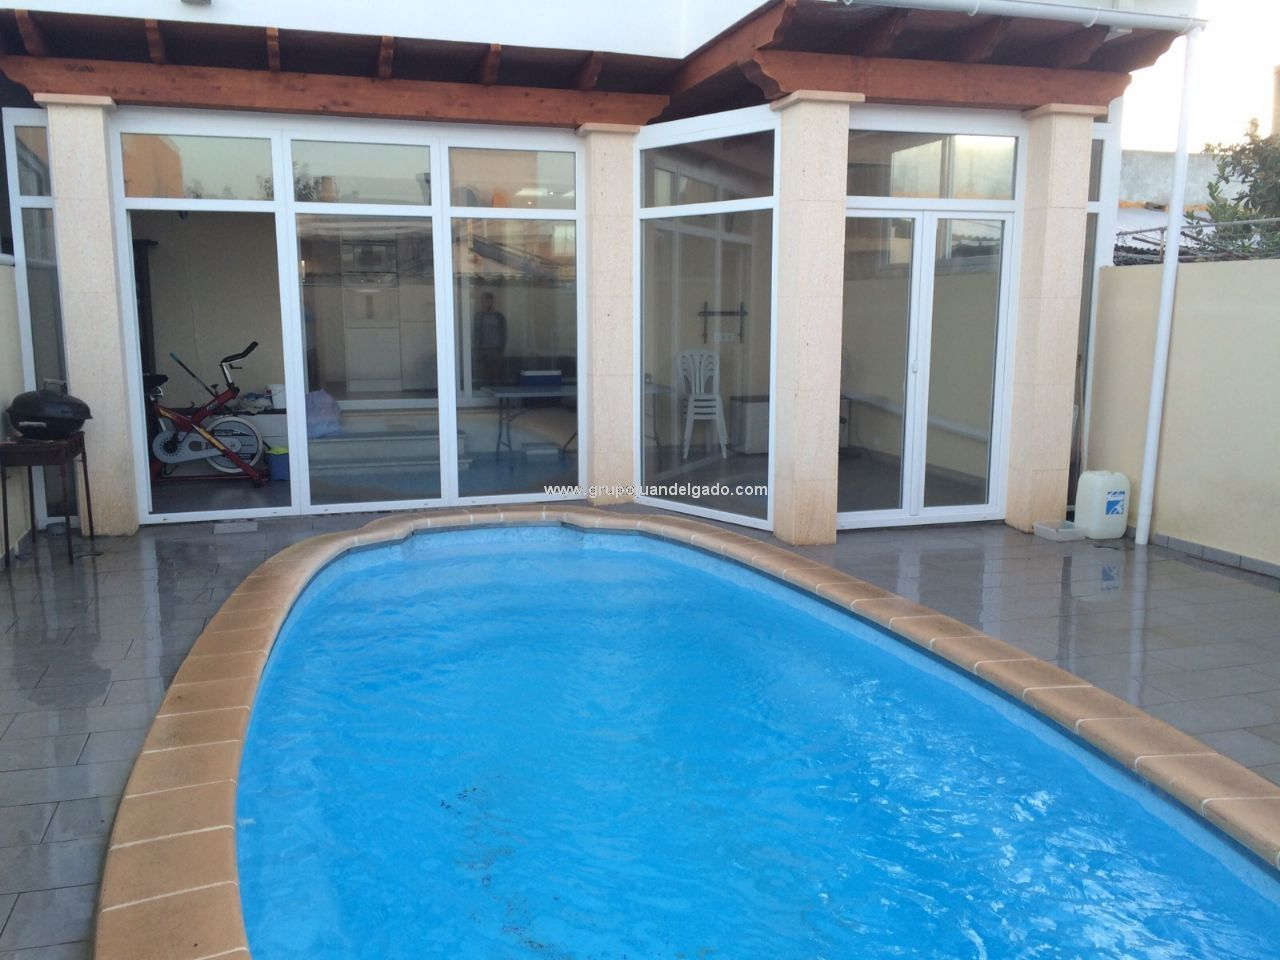 Servicios Inmobiliarios De Calidad En Mallorca Notas De